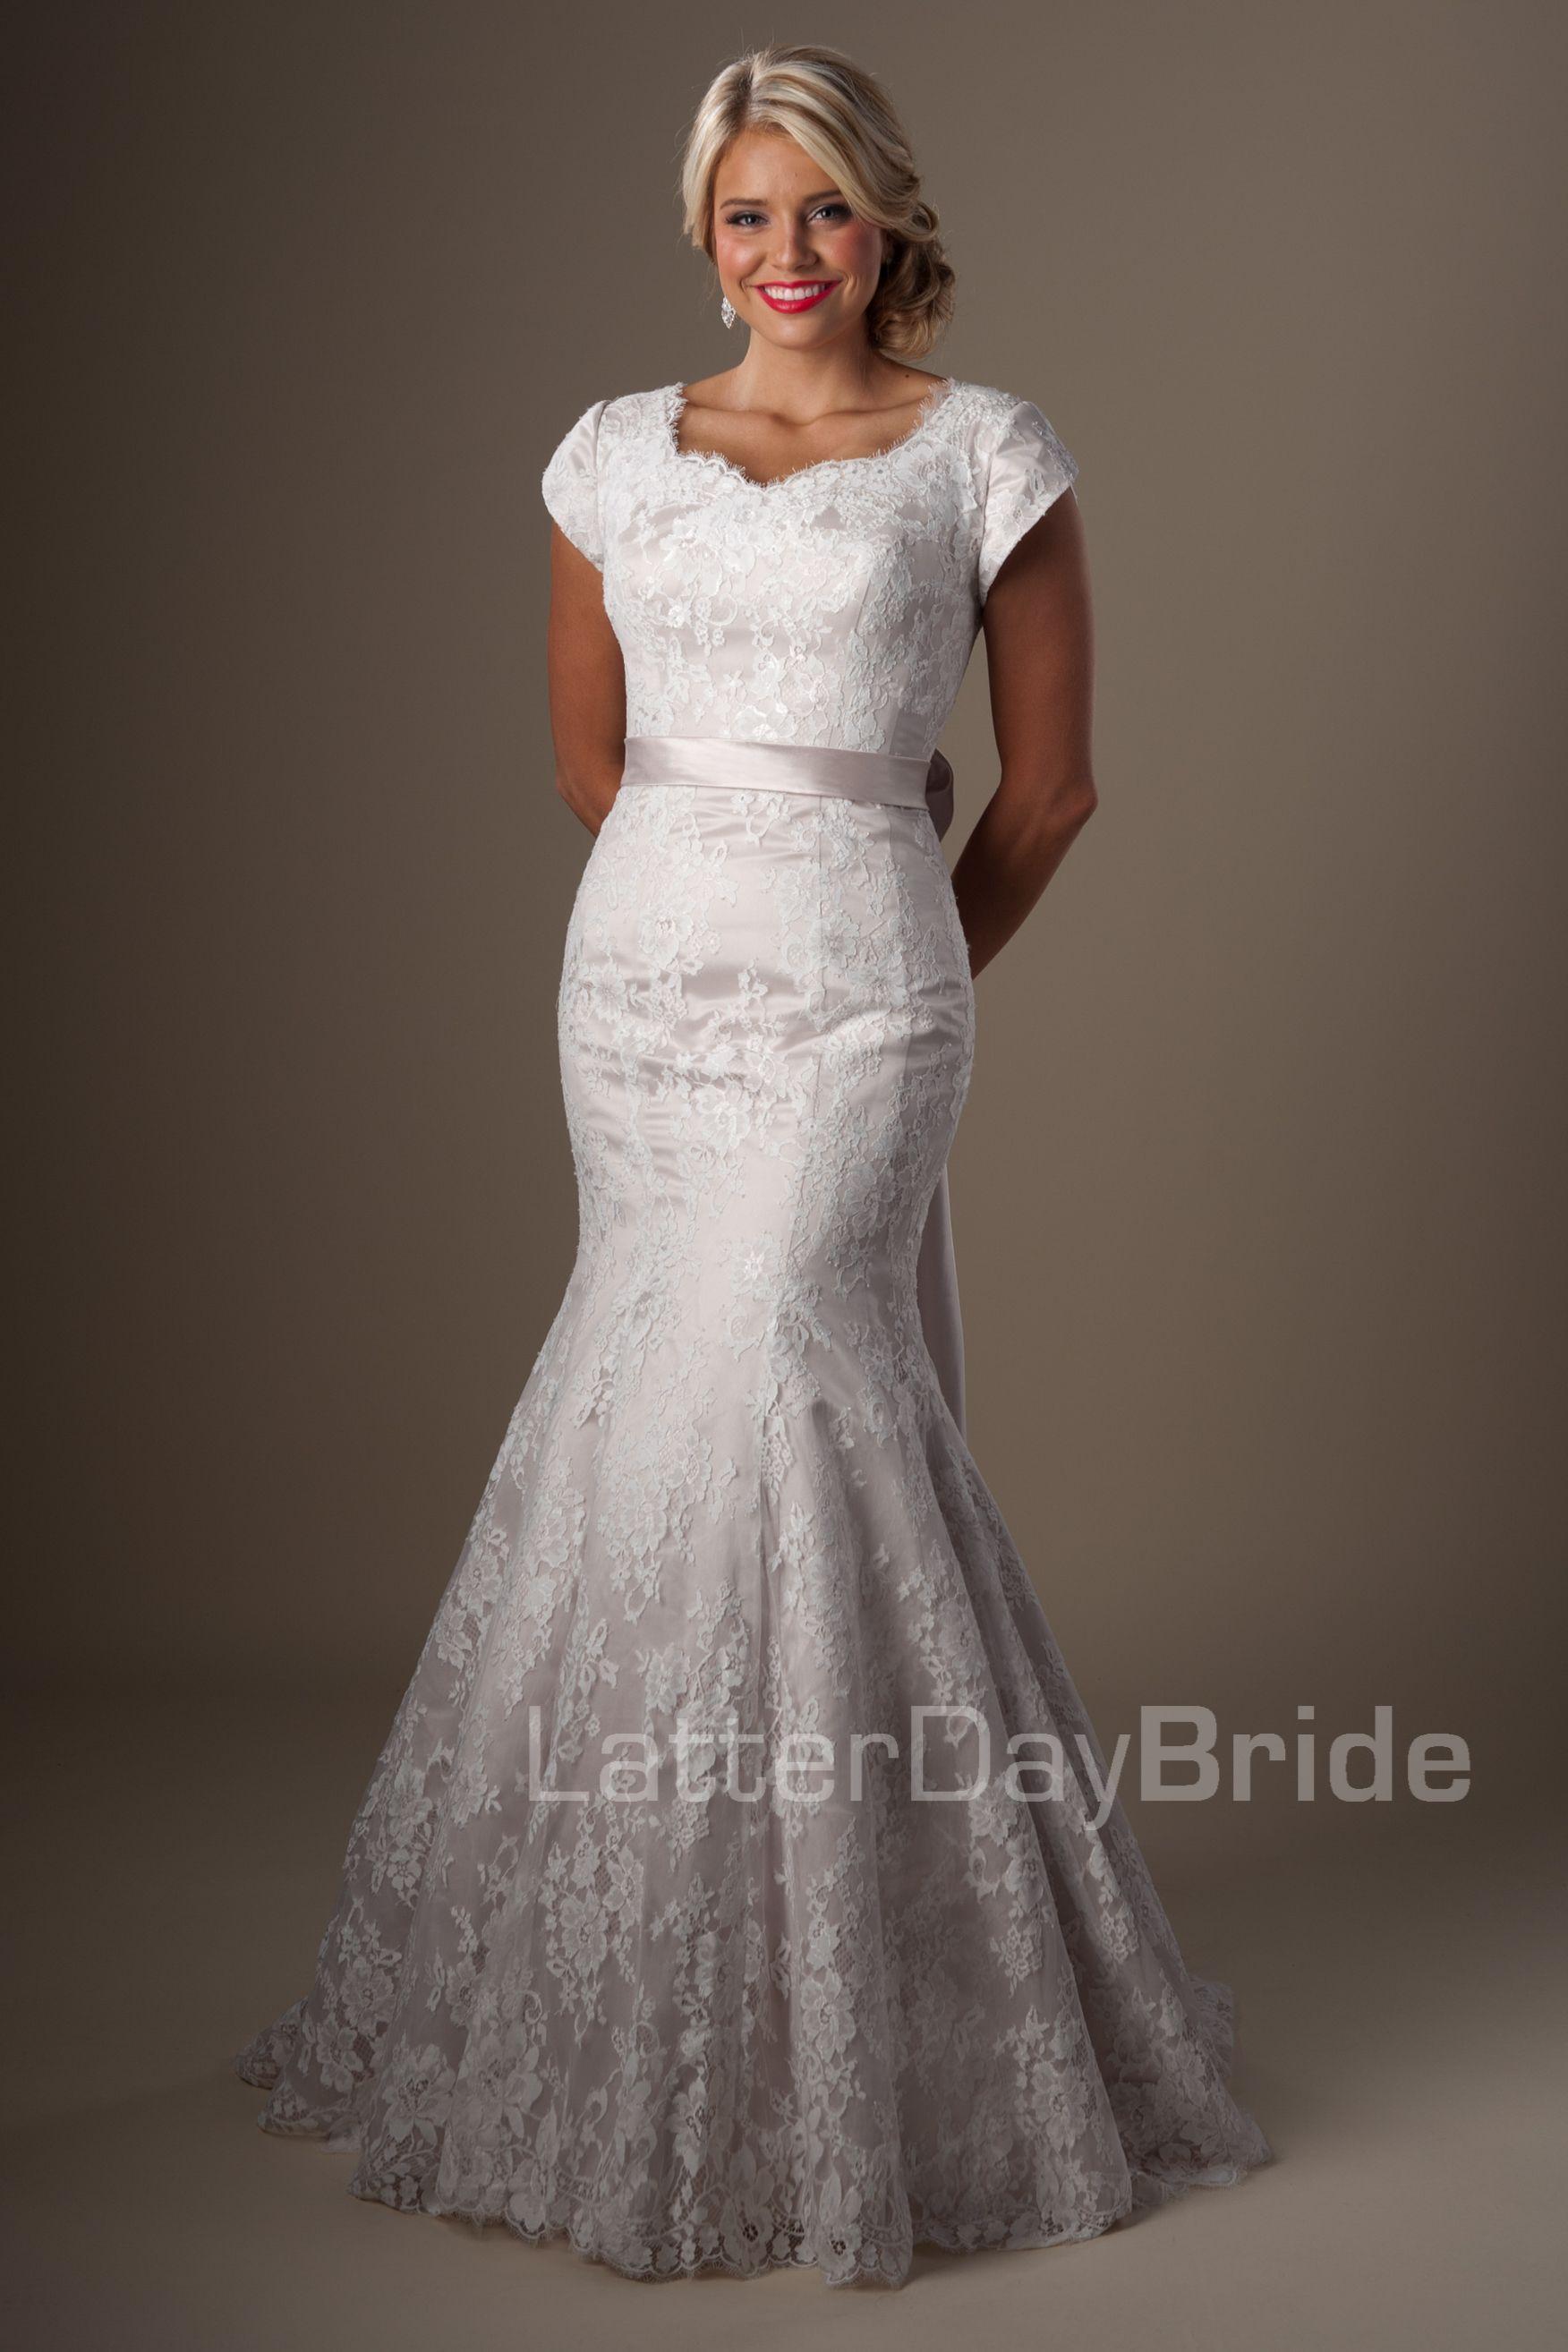 Vestidos de boda modestos: Telluride   bride dresses   Pinterest ...